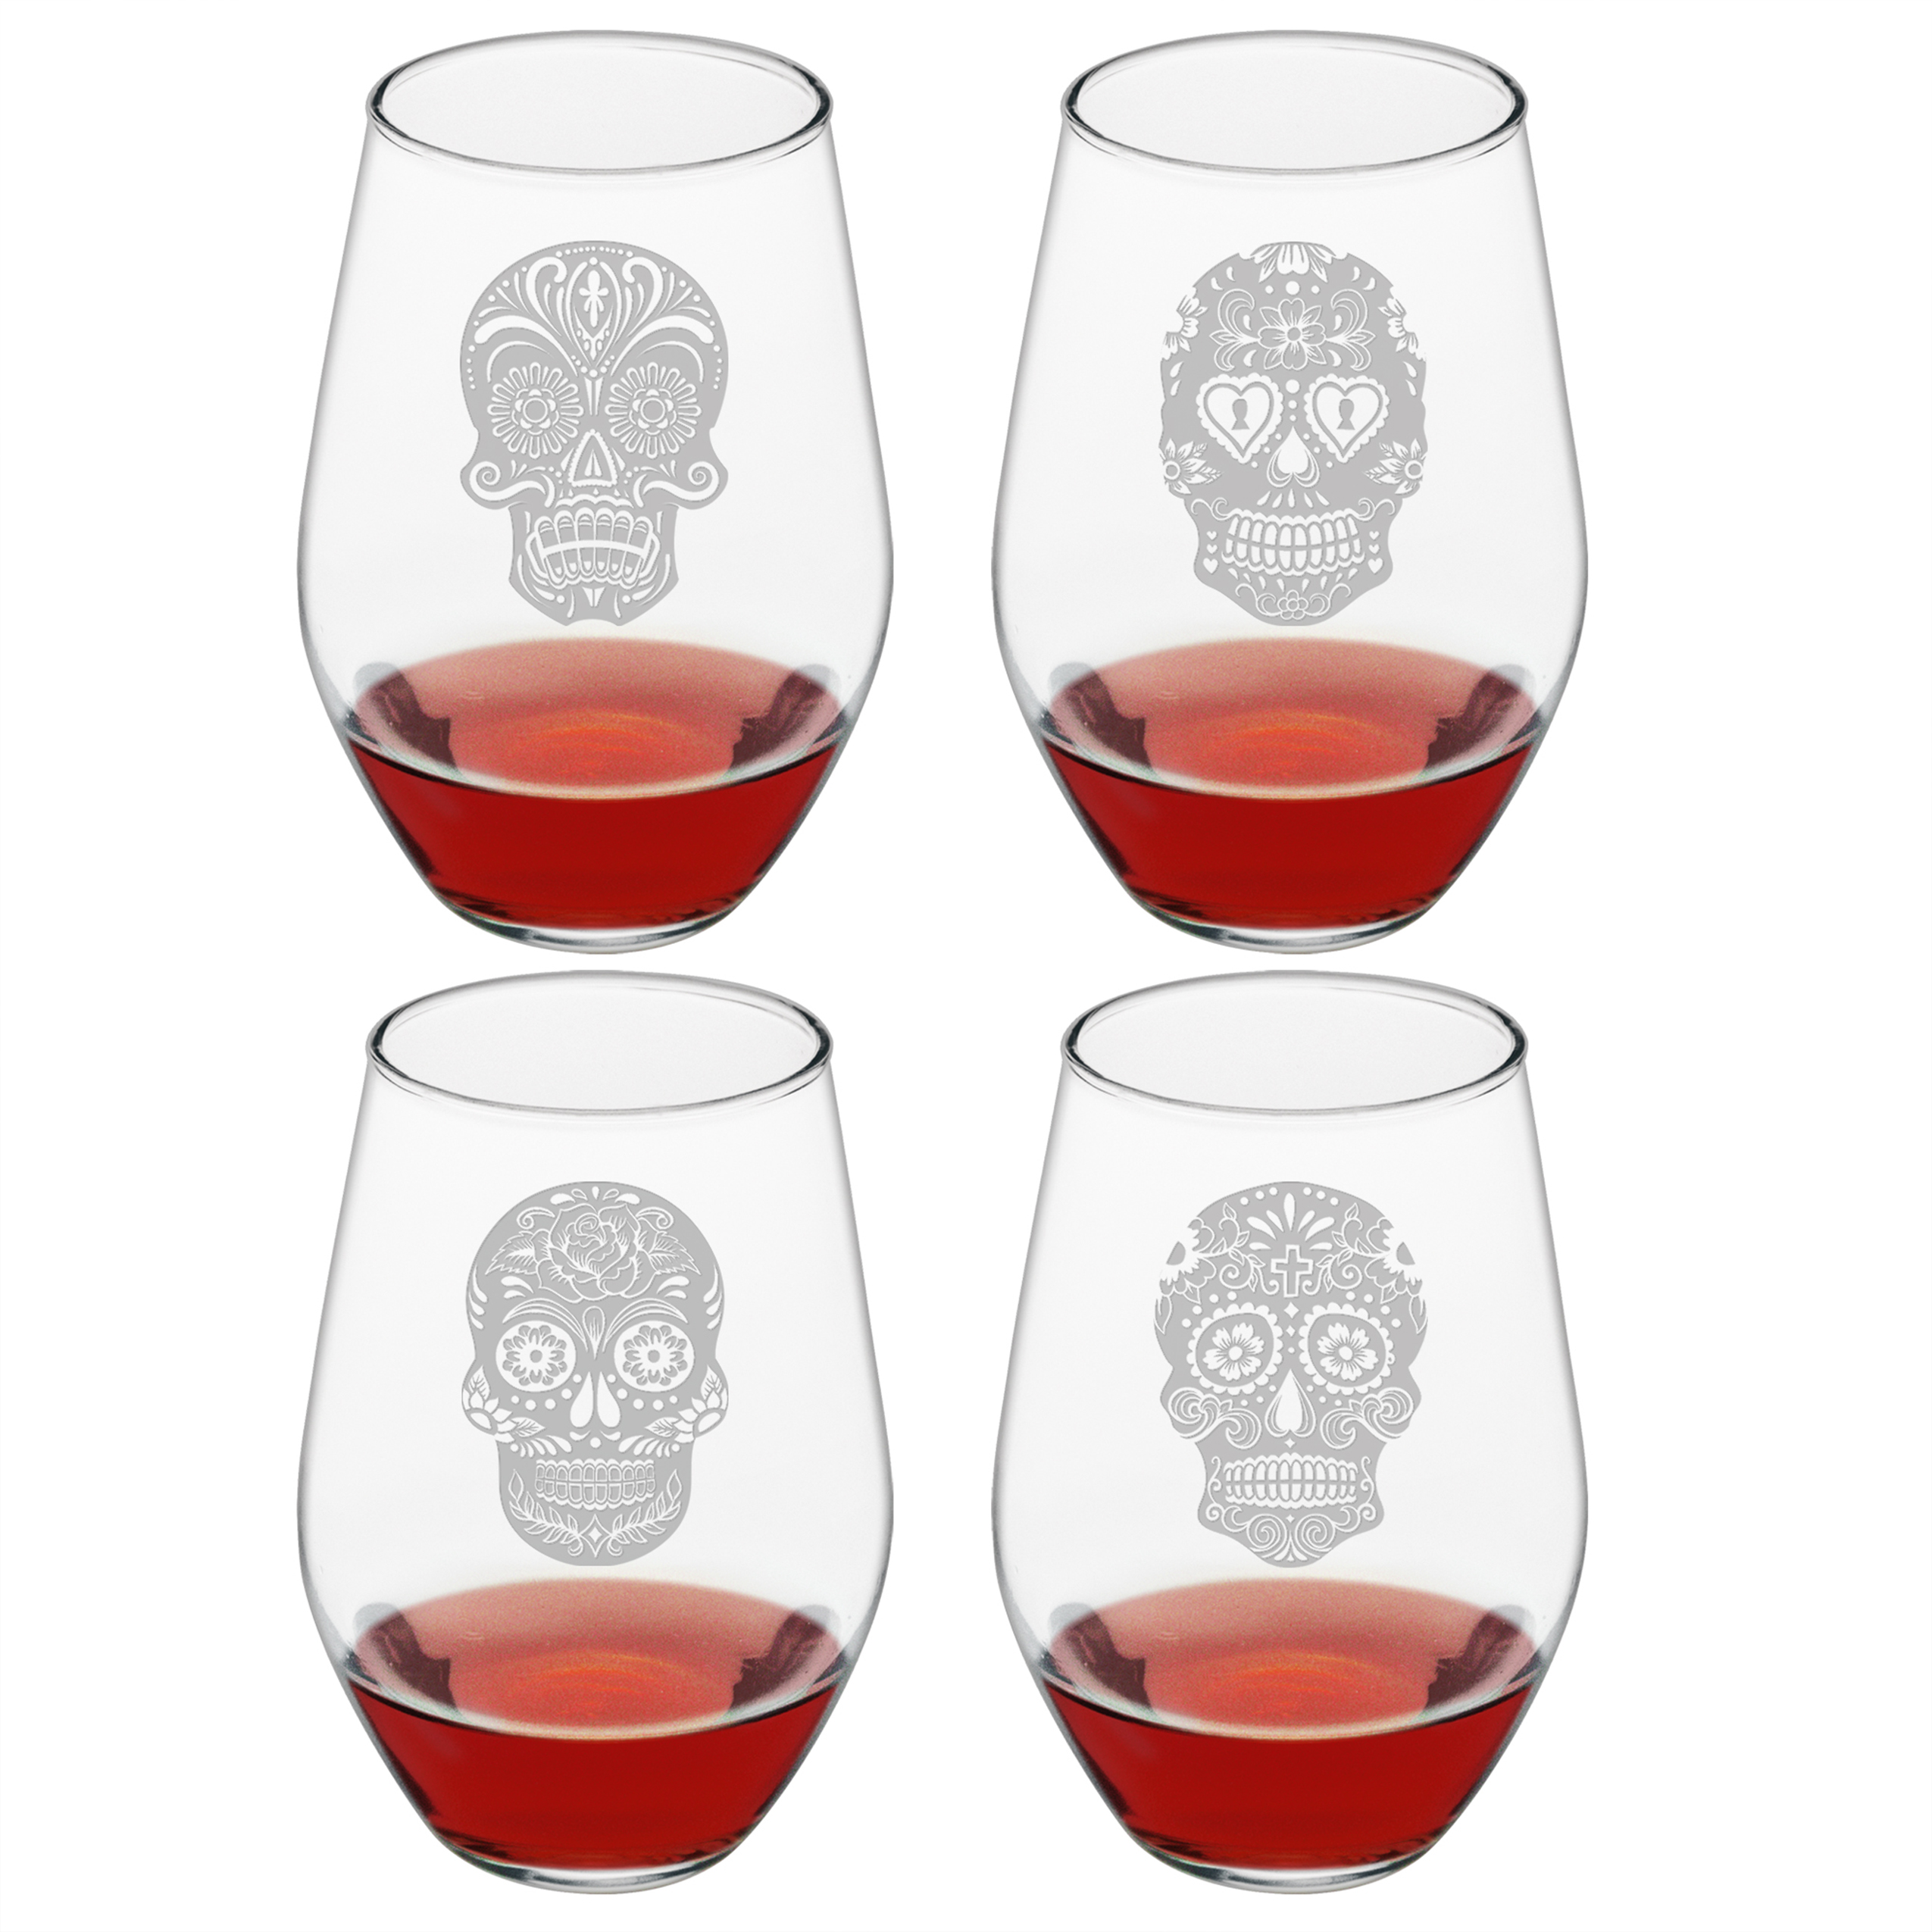 Dia De Los Muertos Stemless Wine Glasses